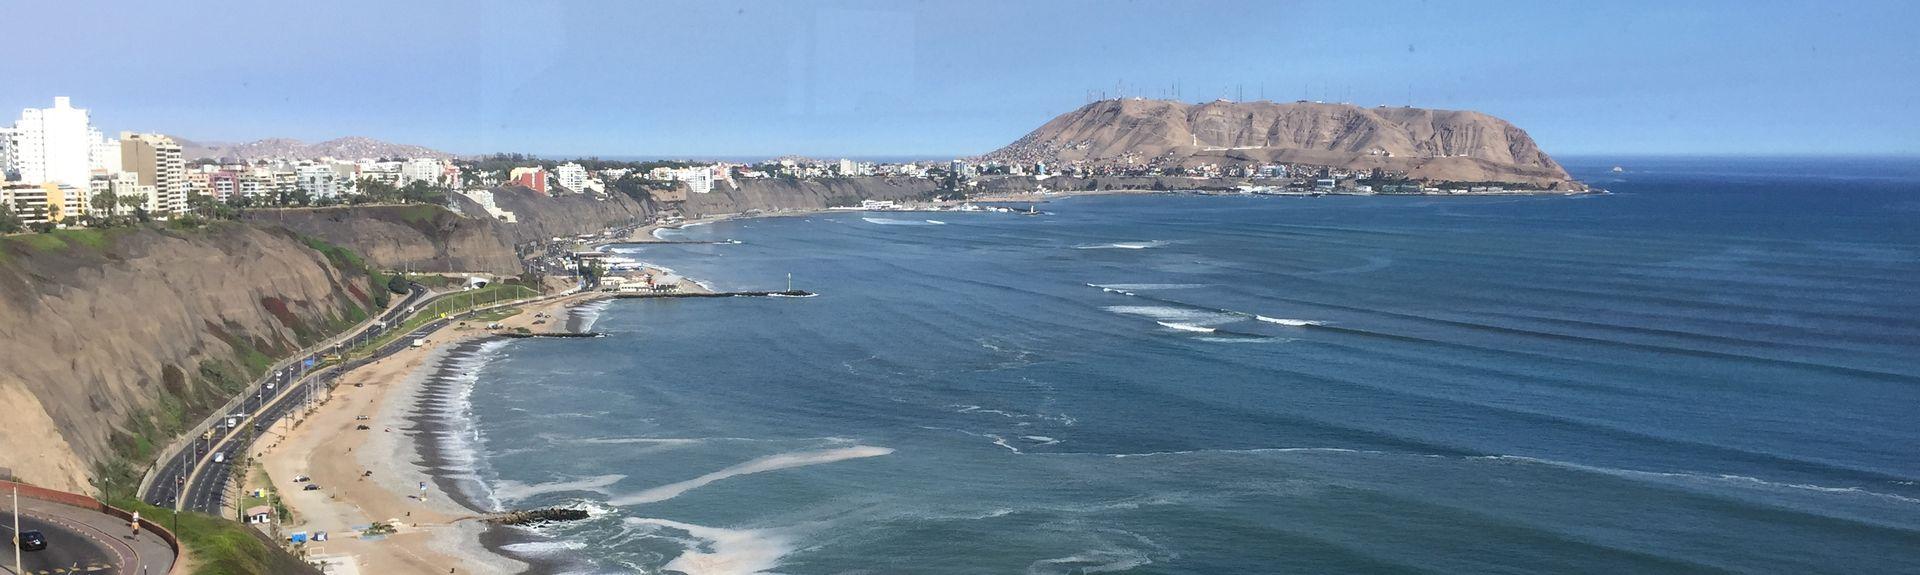 Ate, Lima, Perú